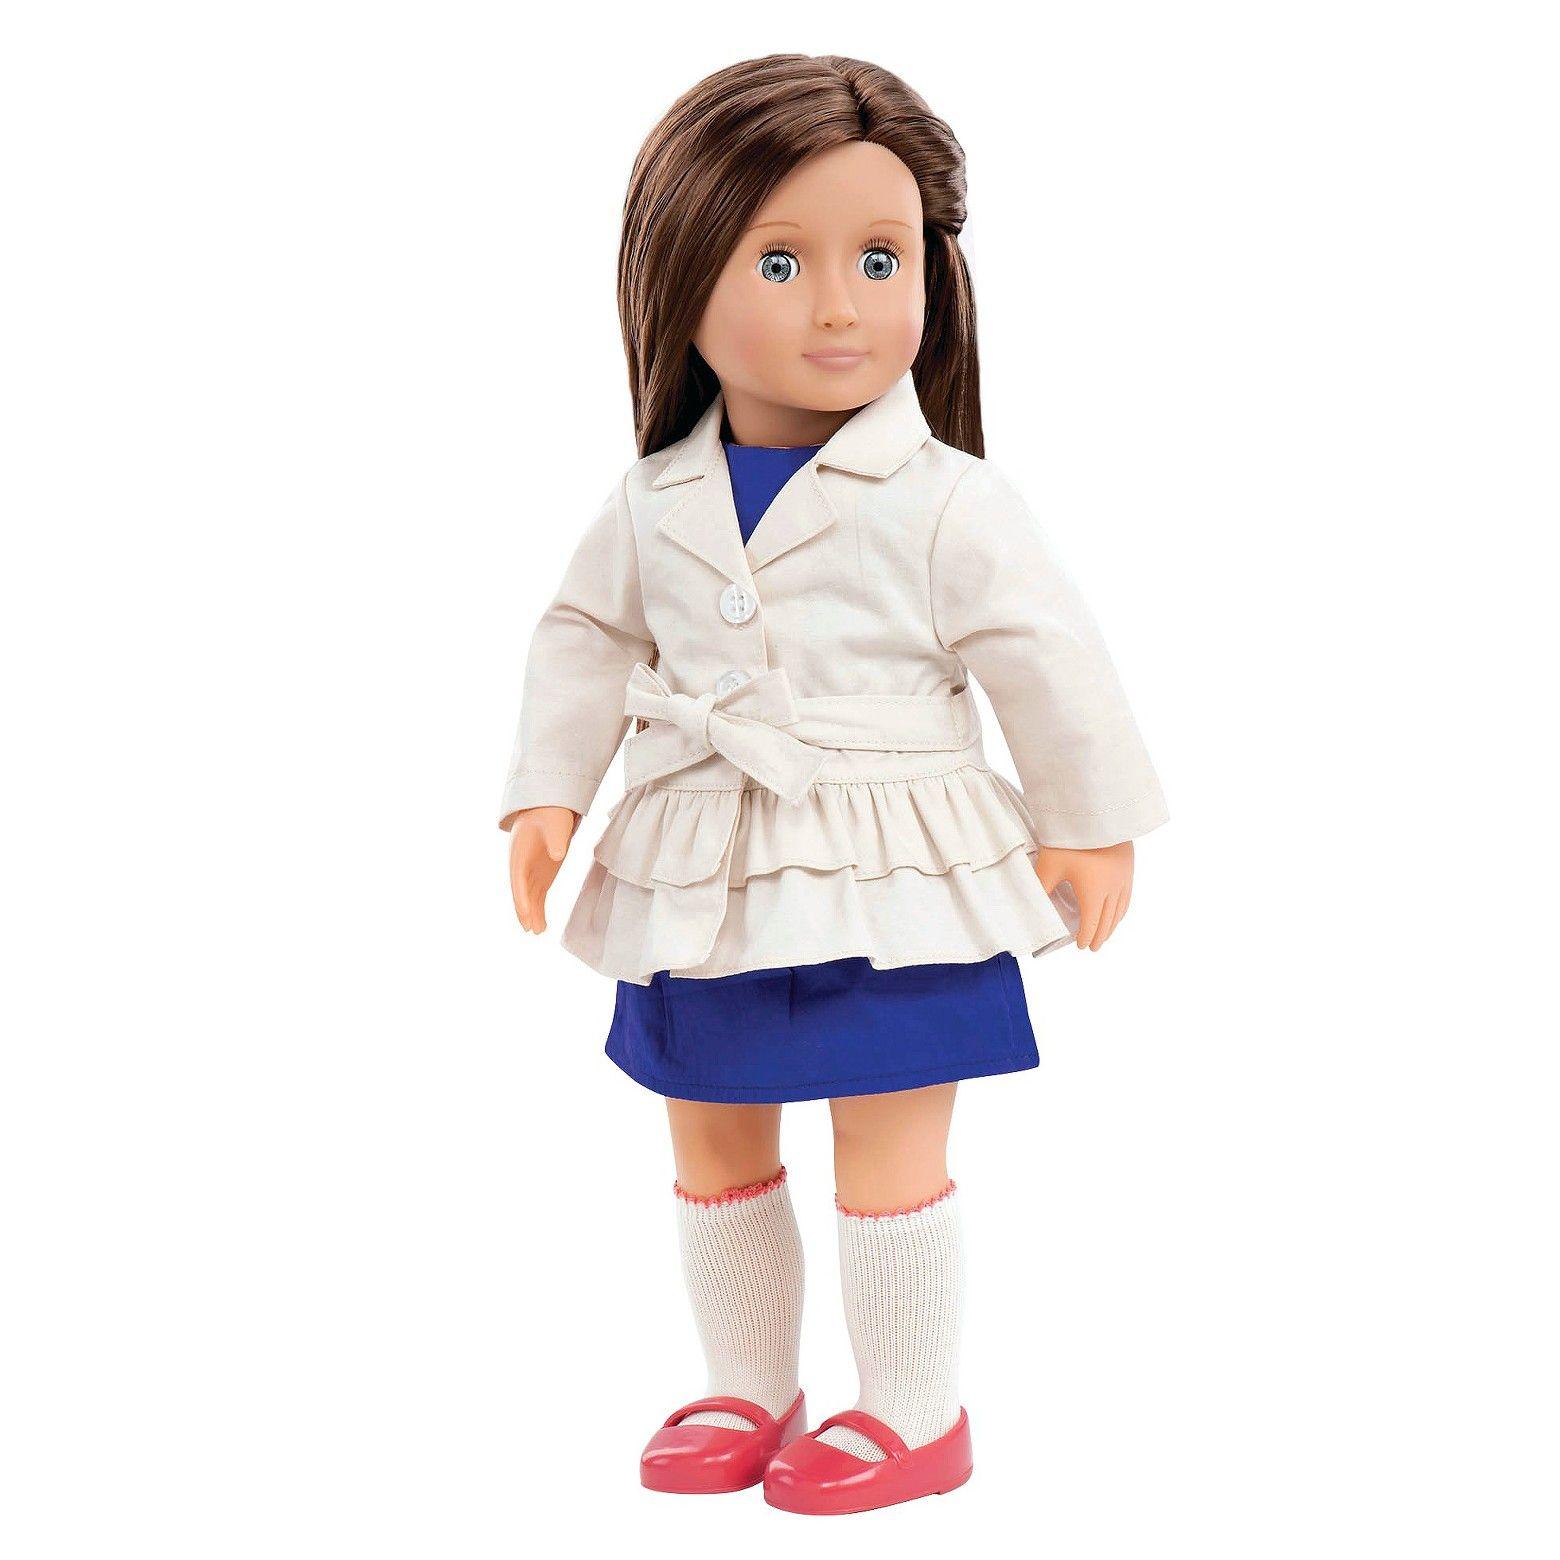 Our Generation Regular Doll Lilia Our generation dolls